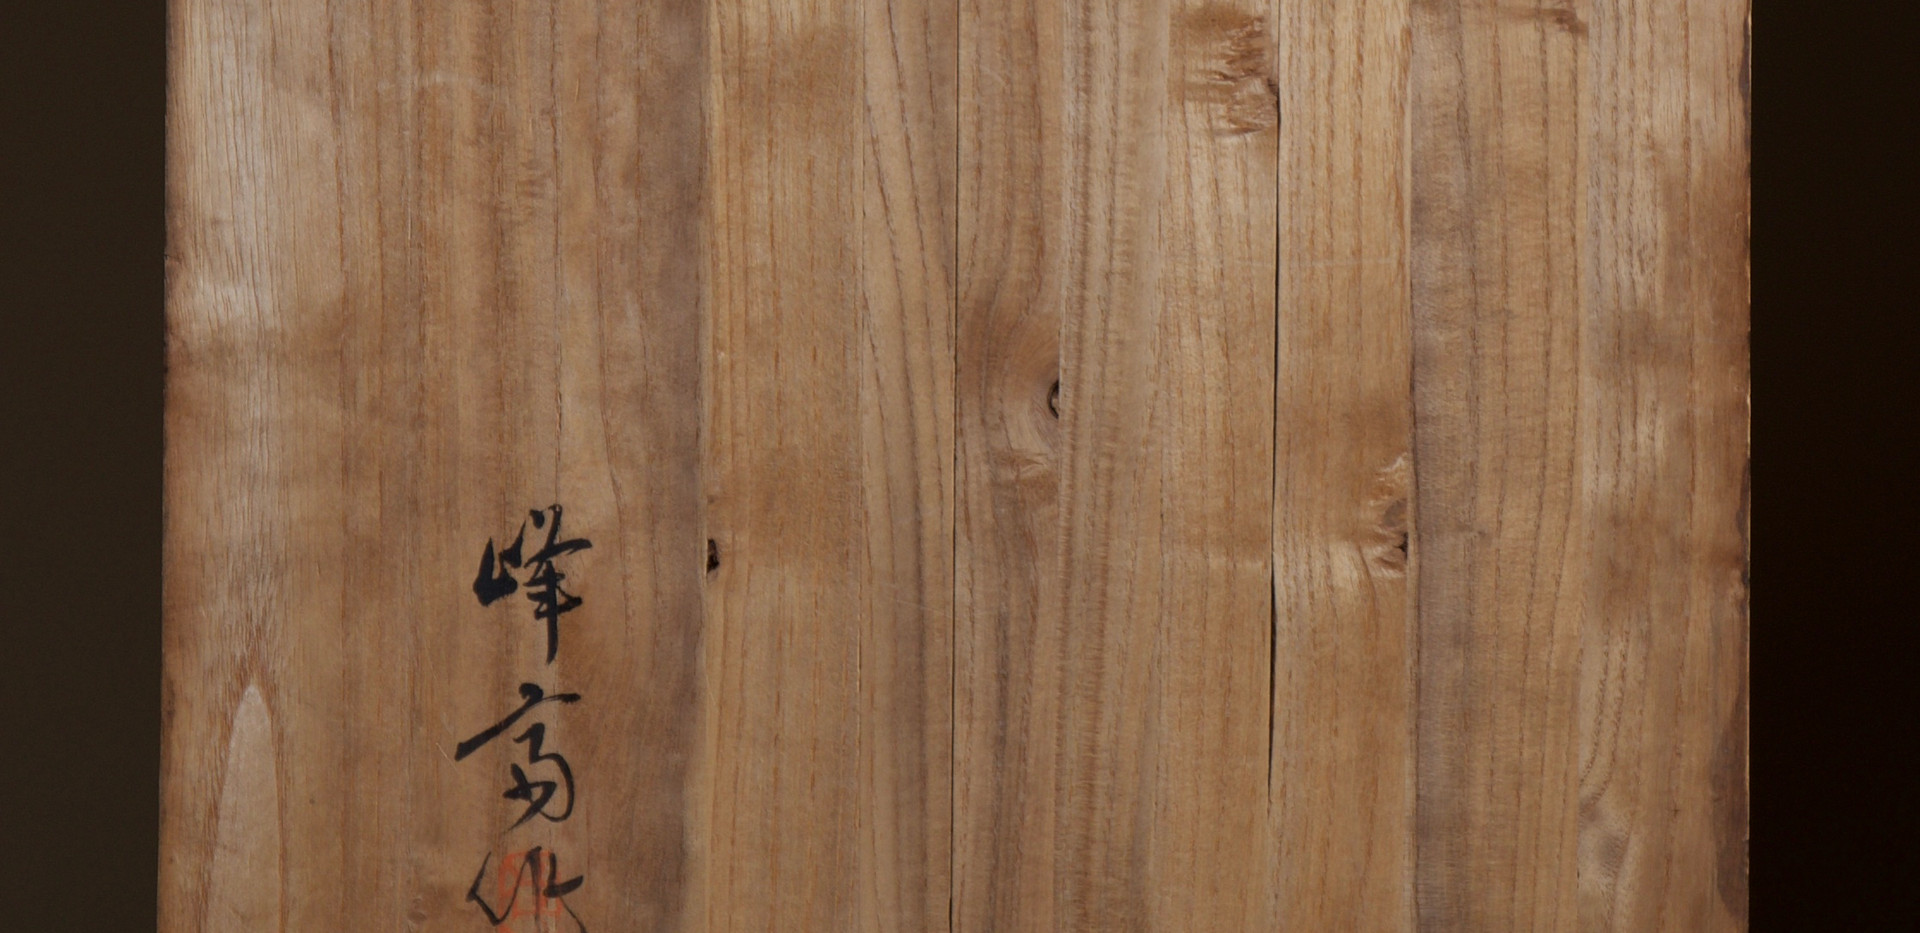 Yokota Hosai (Minesai) Leached Bamboo Basket 08.jpg